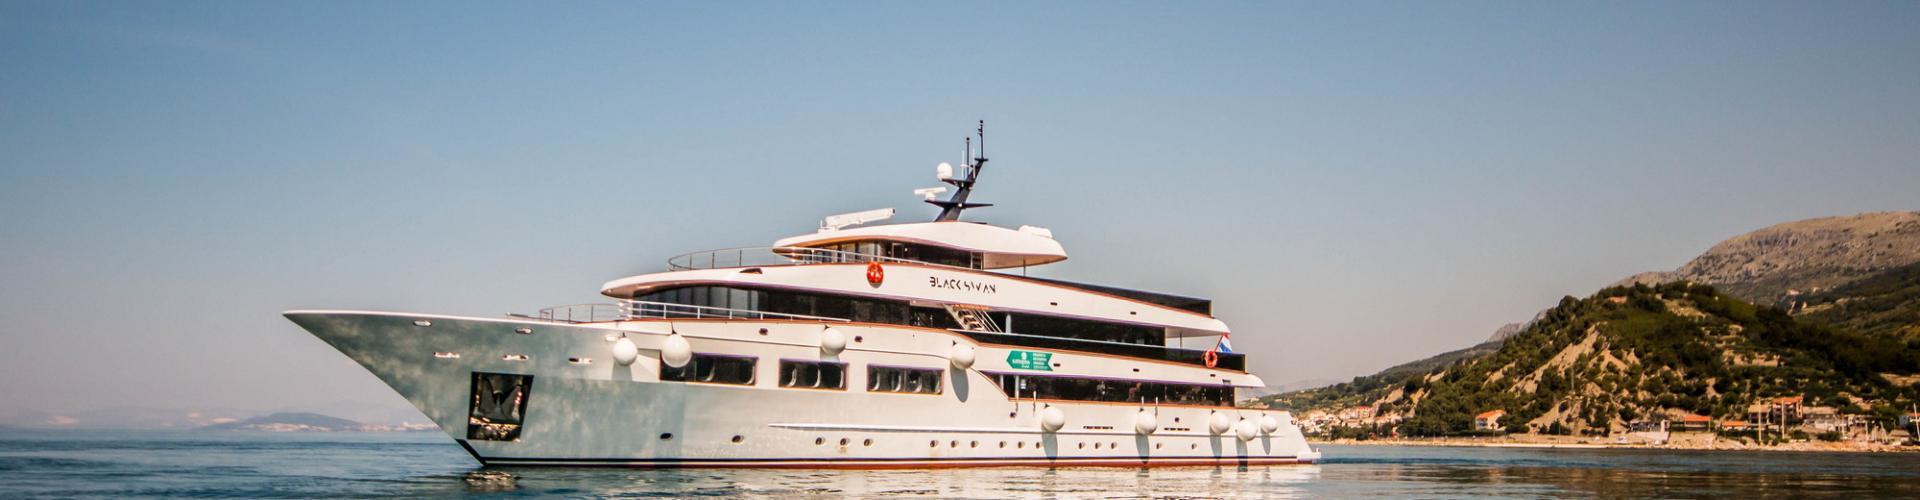 Deluxe Superior cruiser MV Black Swan- motor yacht